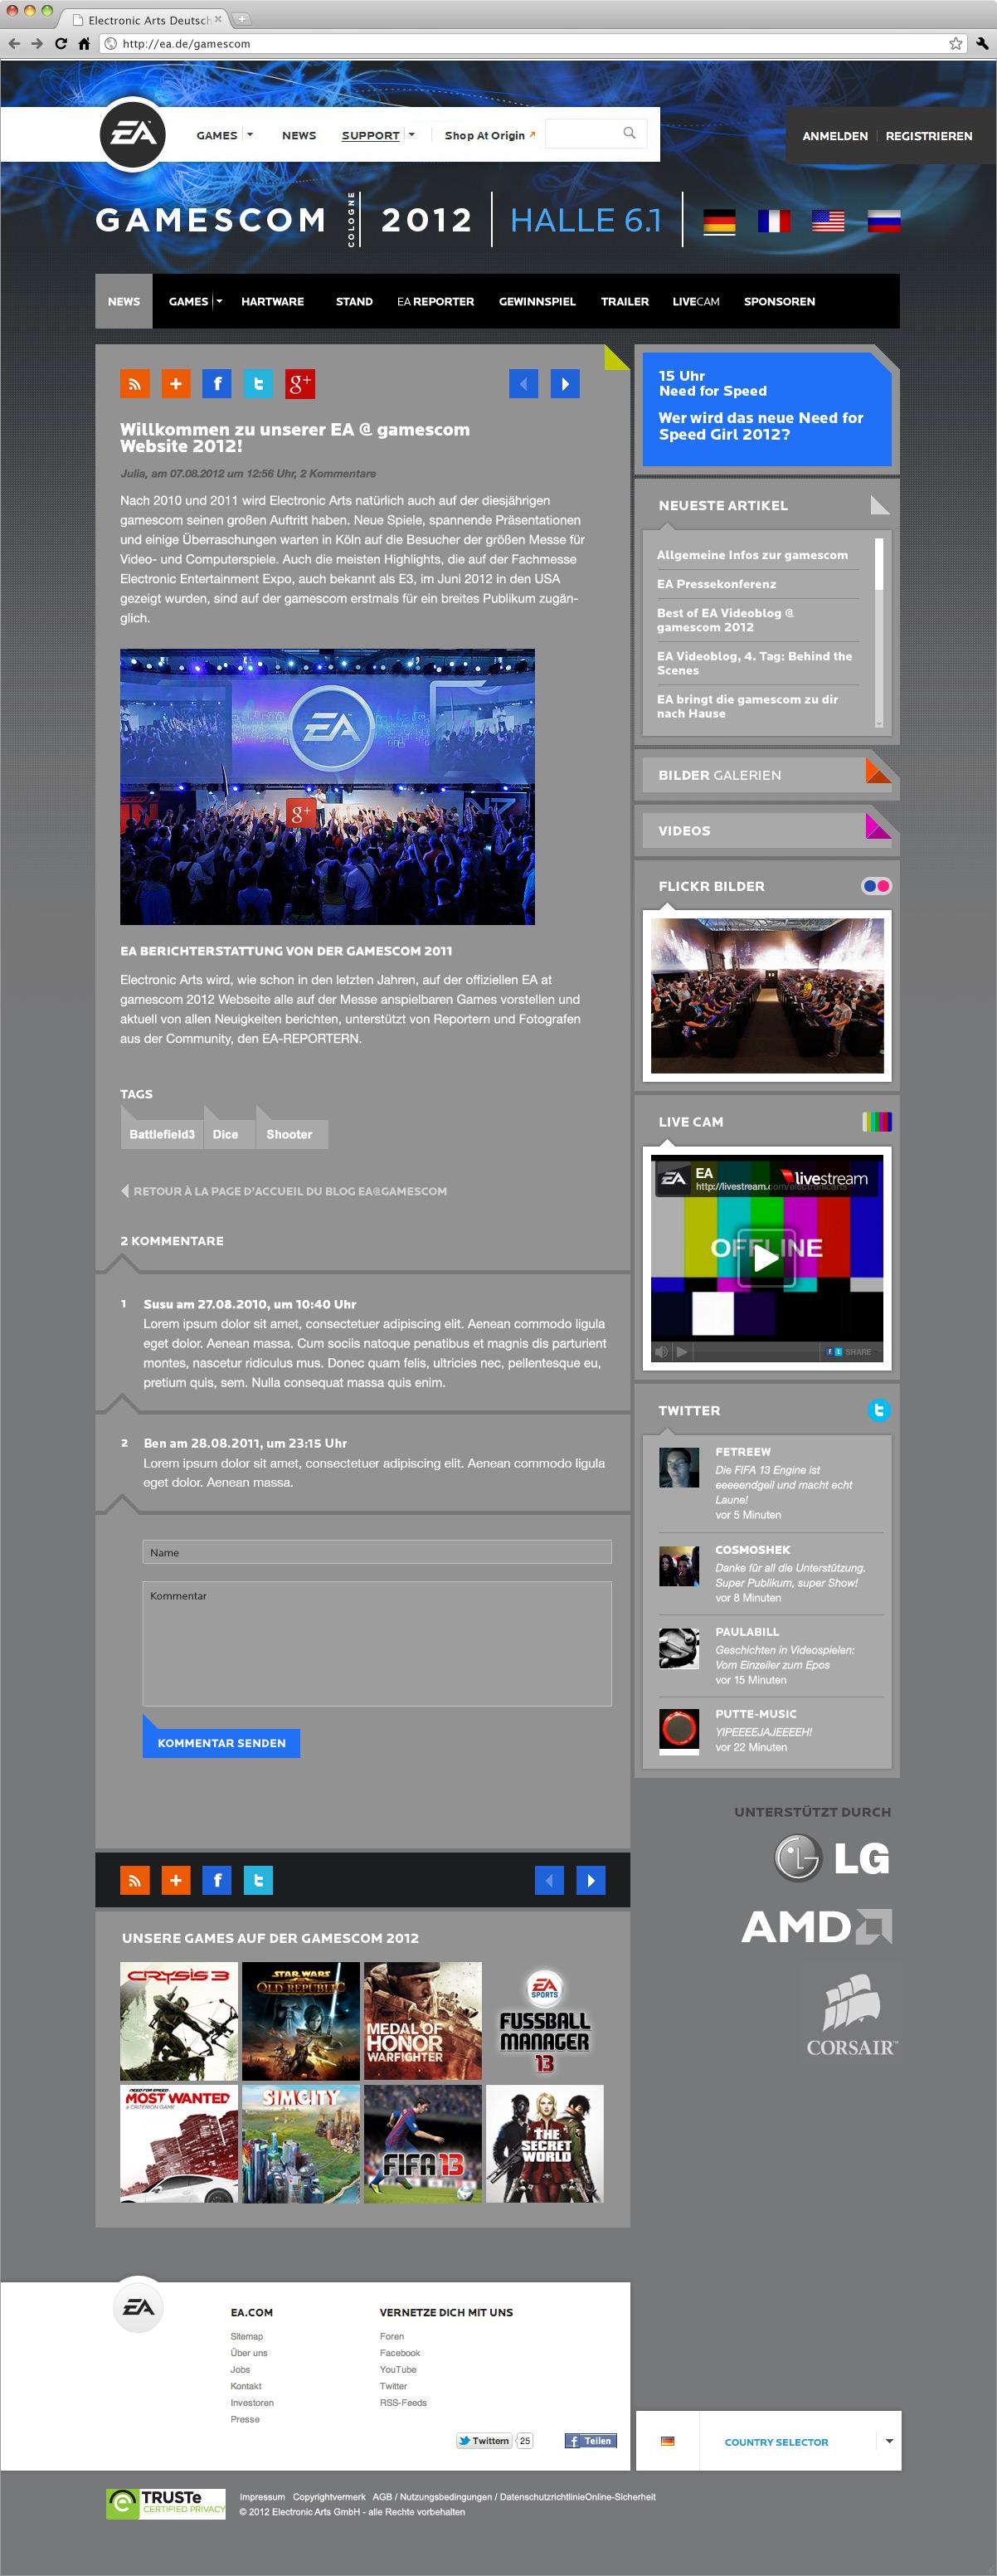 Webdesign-artikelseite-ea-electronic-arts-at-gamescom-2012-cologne